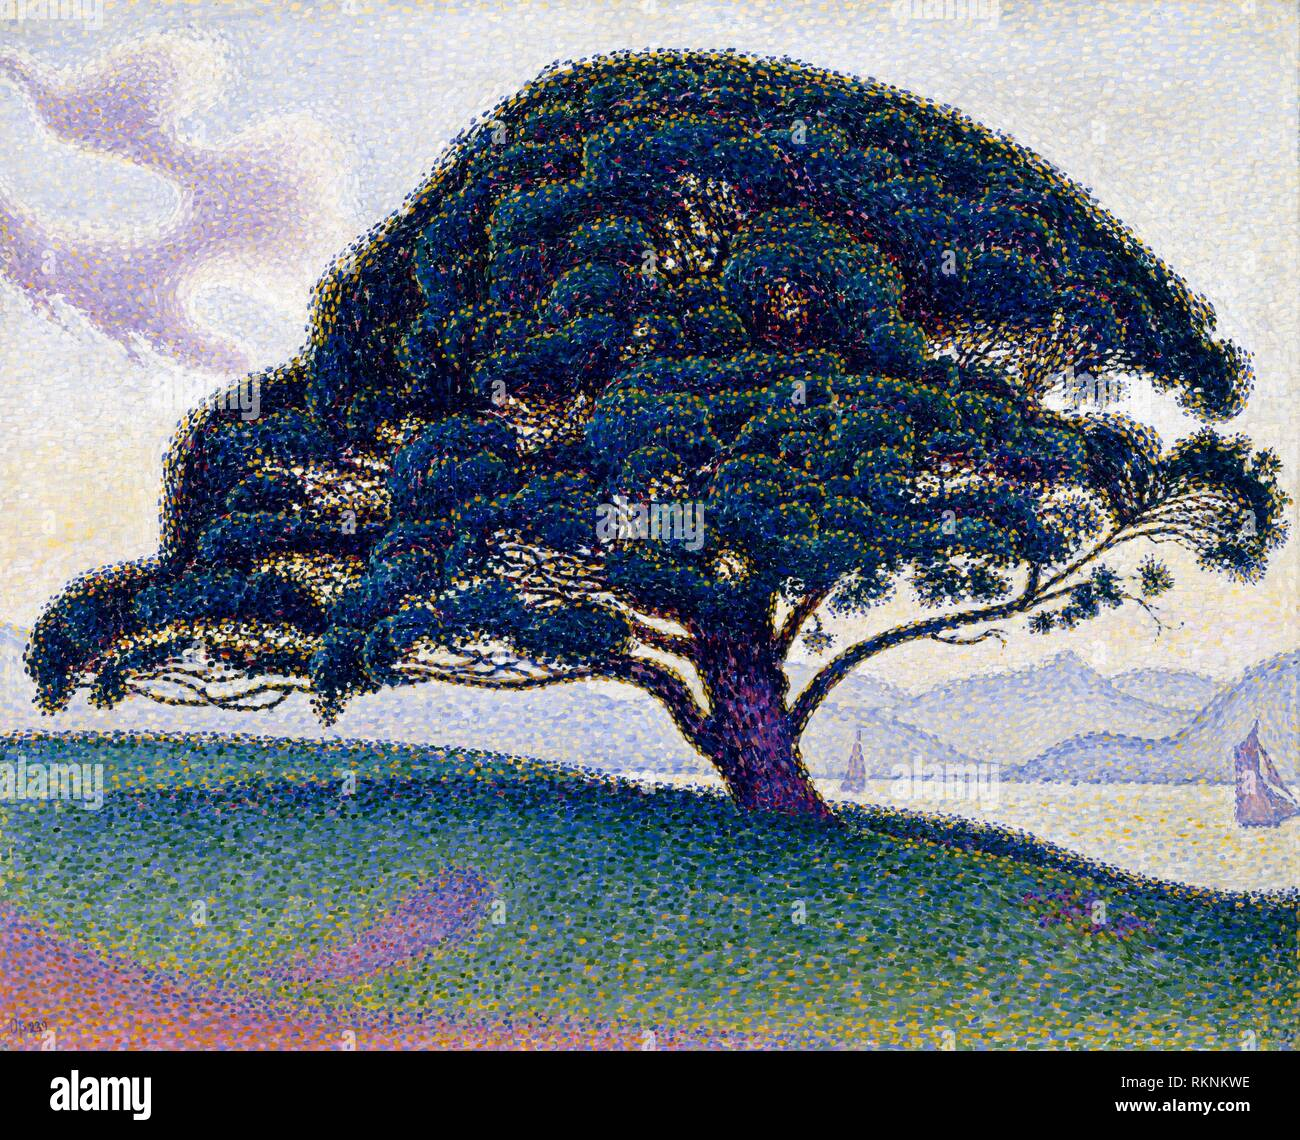 The Bonaventure Pine (1893) by Paul Signac, 1863–1935. The Museum of Fine Arts, Houston, USA. Stock Photo